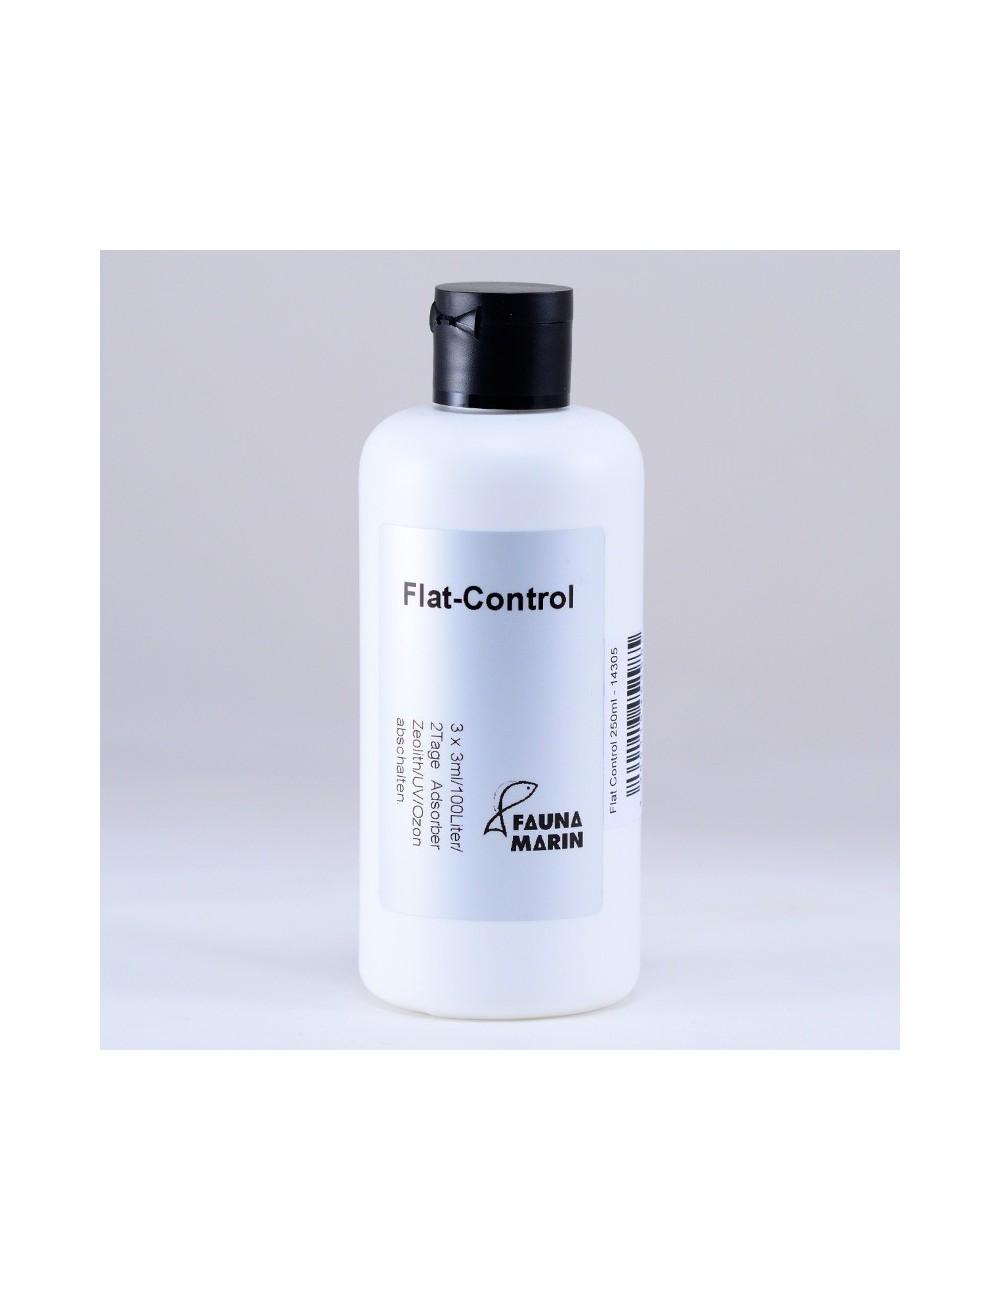 FAUNA MARIN - Flat Control 250 ml